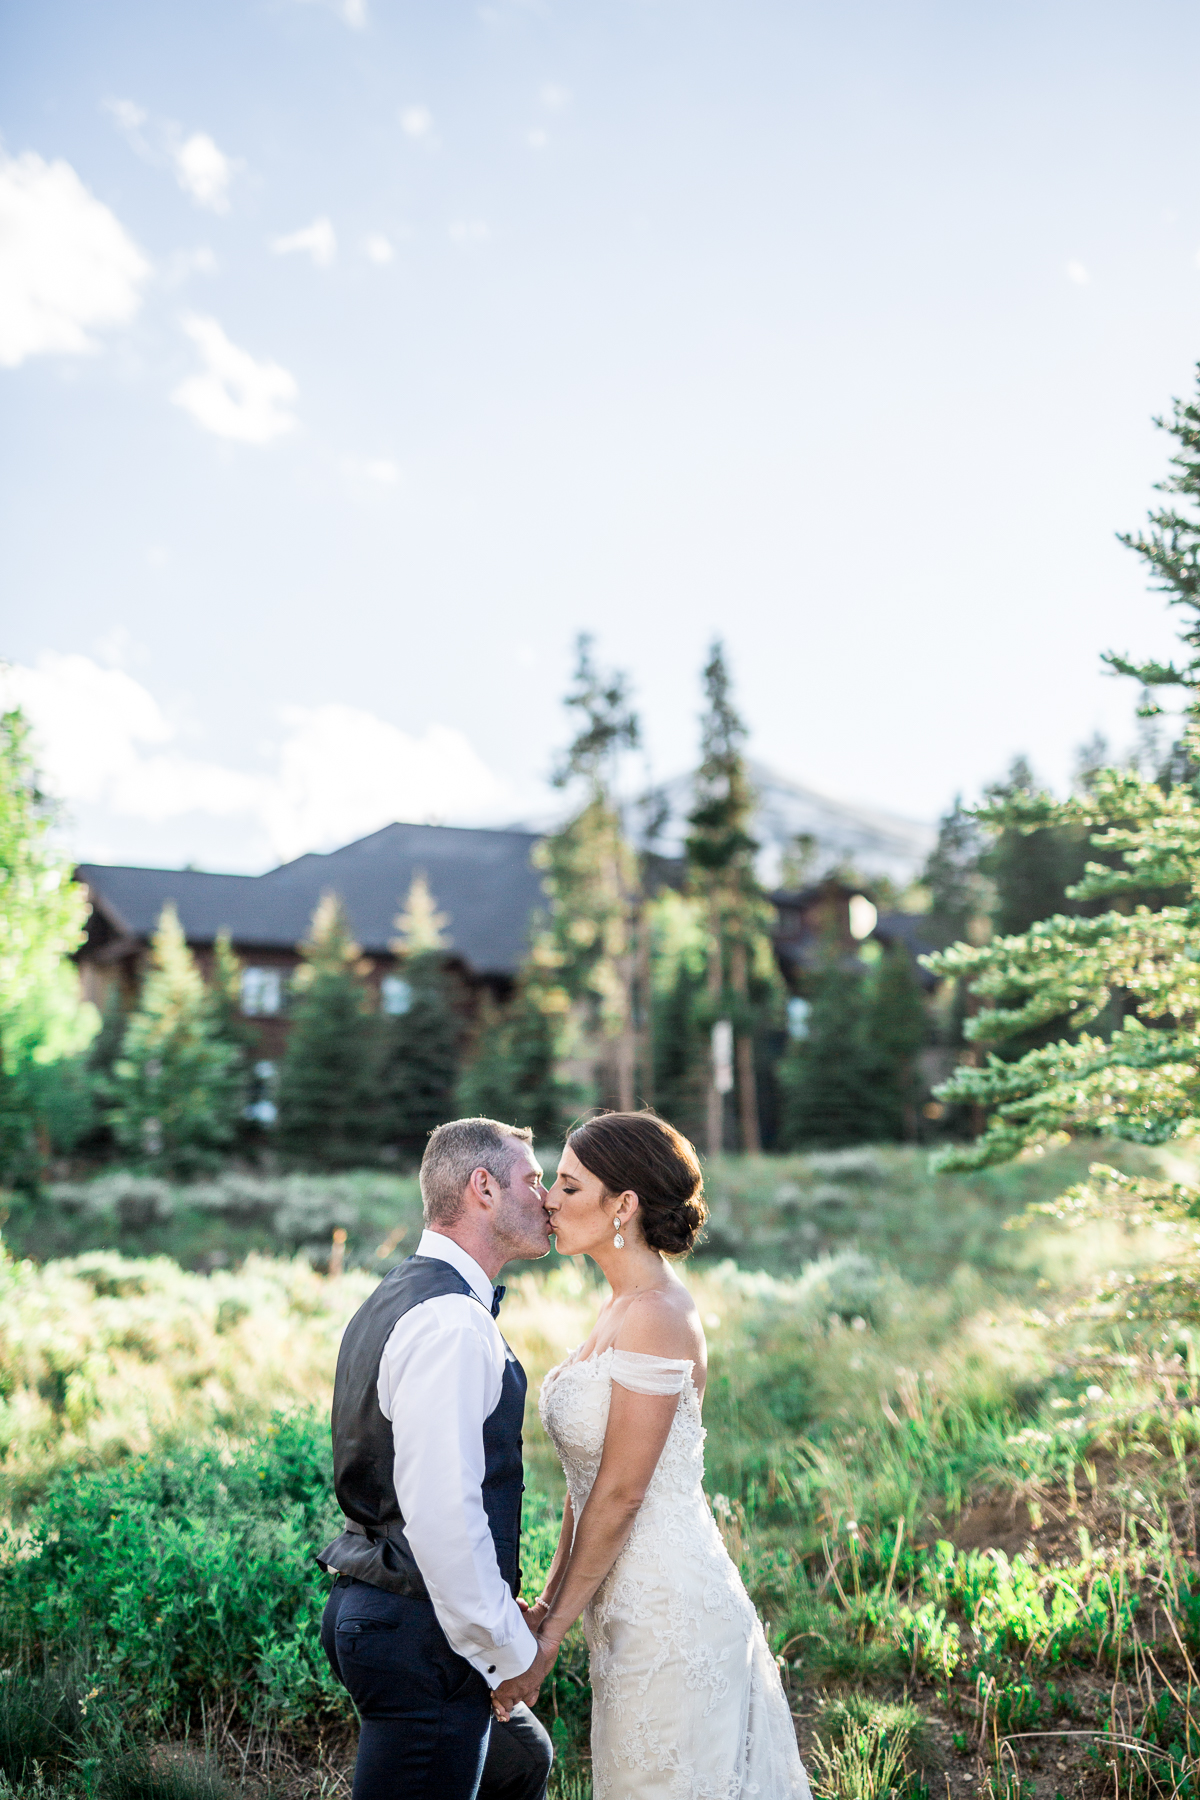 StaciDesign-Colorado-Wedding-5547.jpg